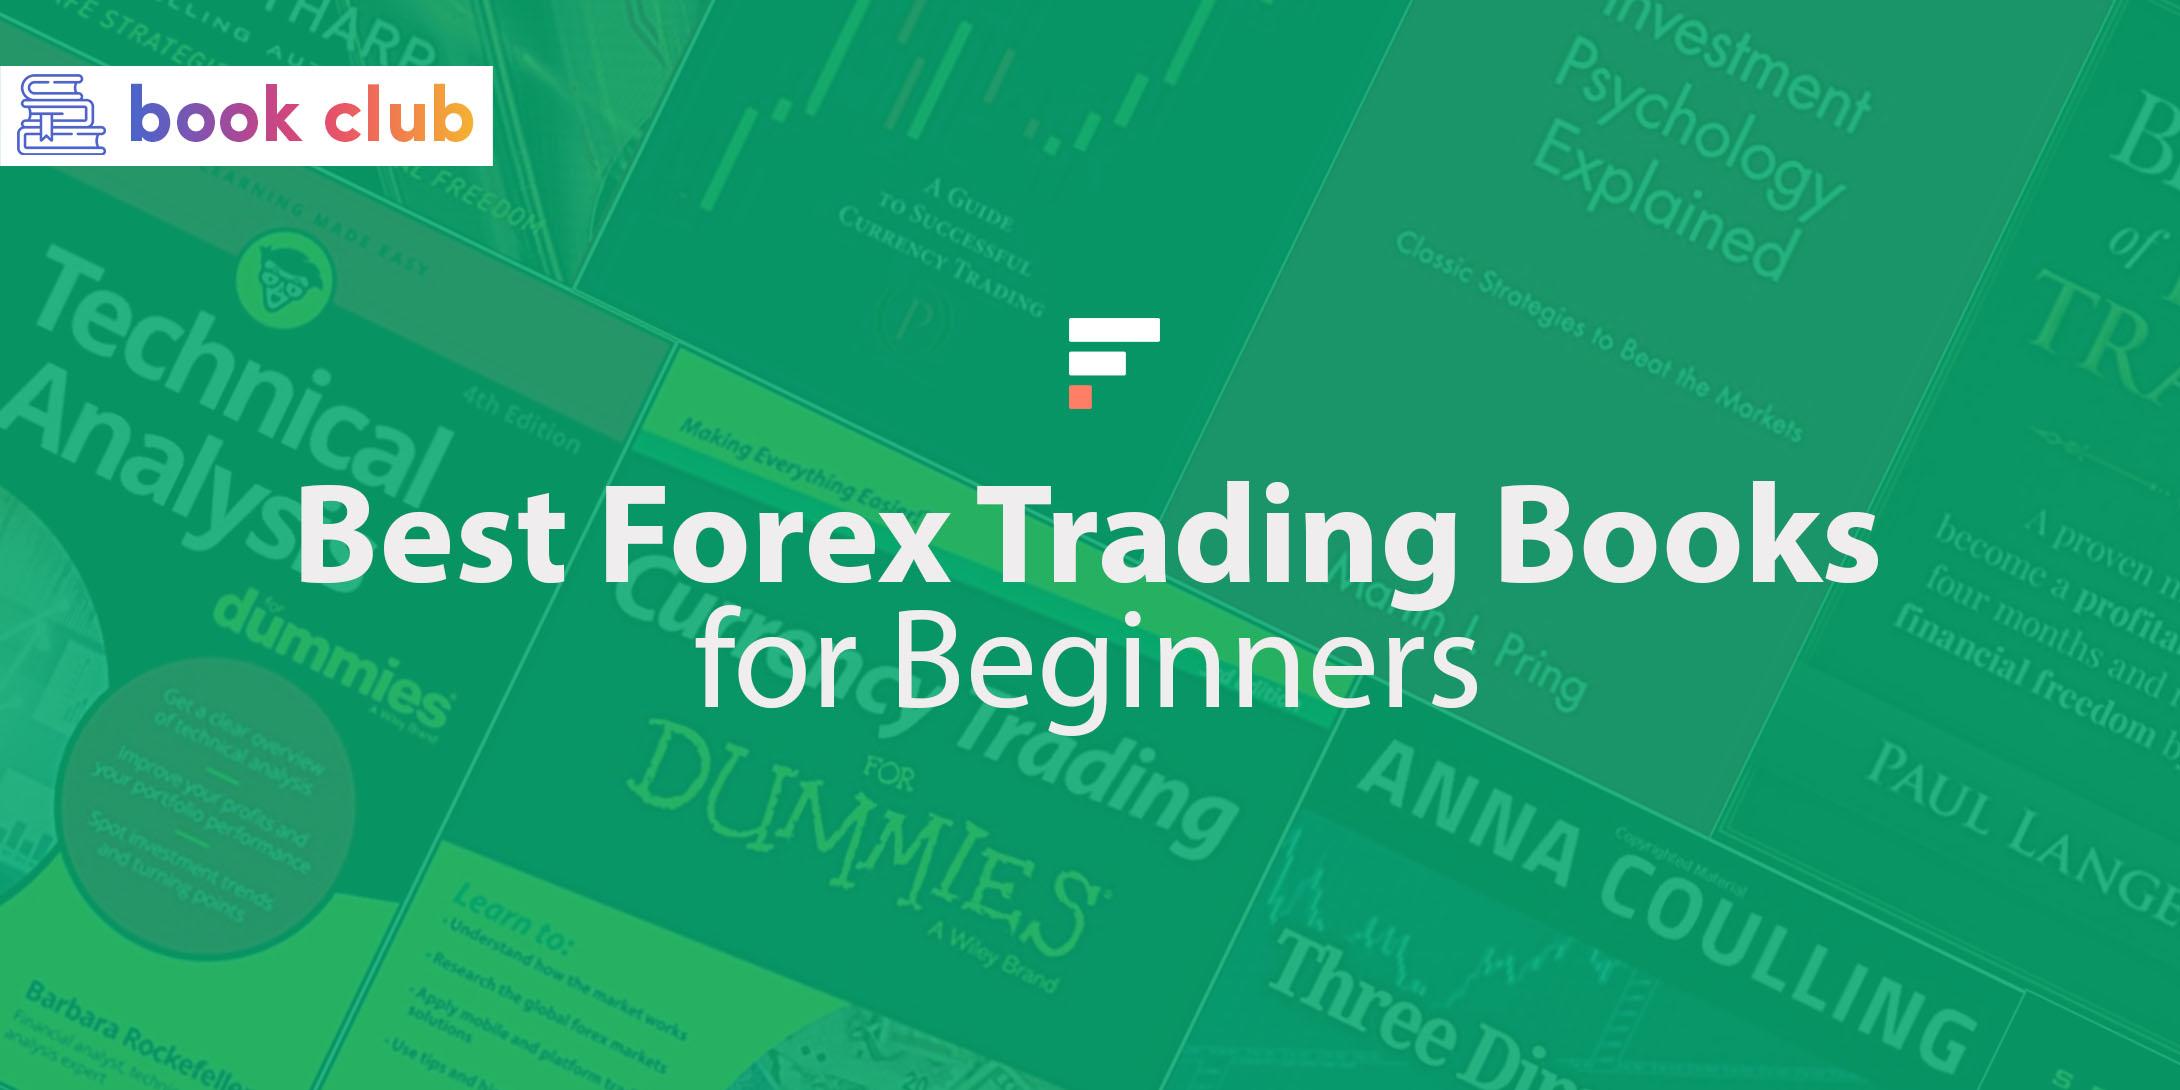 7 Best Forex Trading Books for Beginners